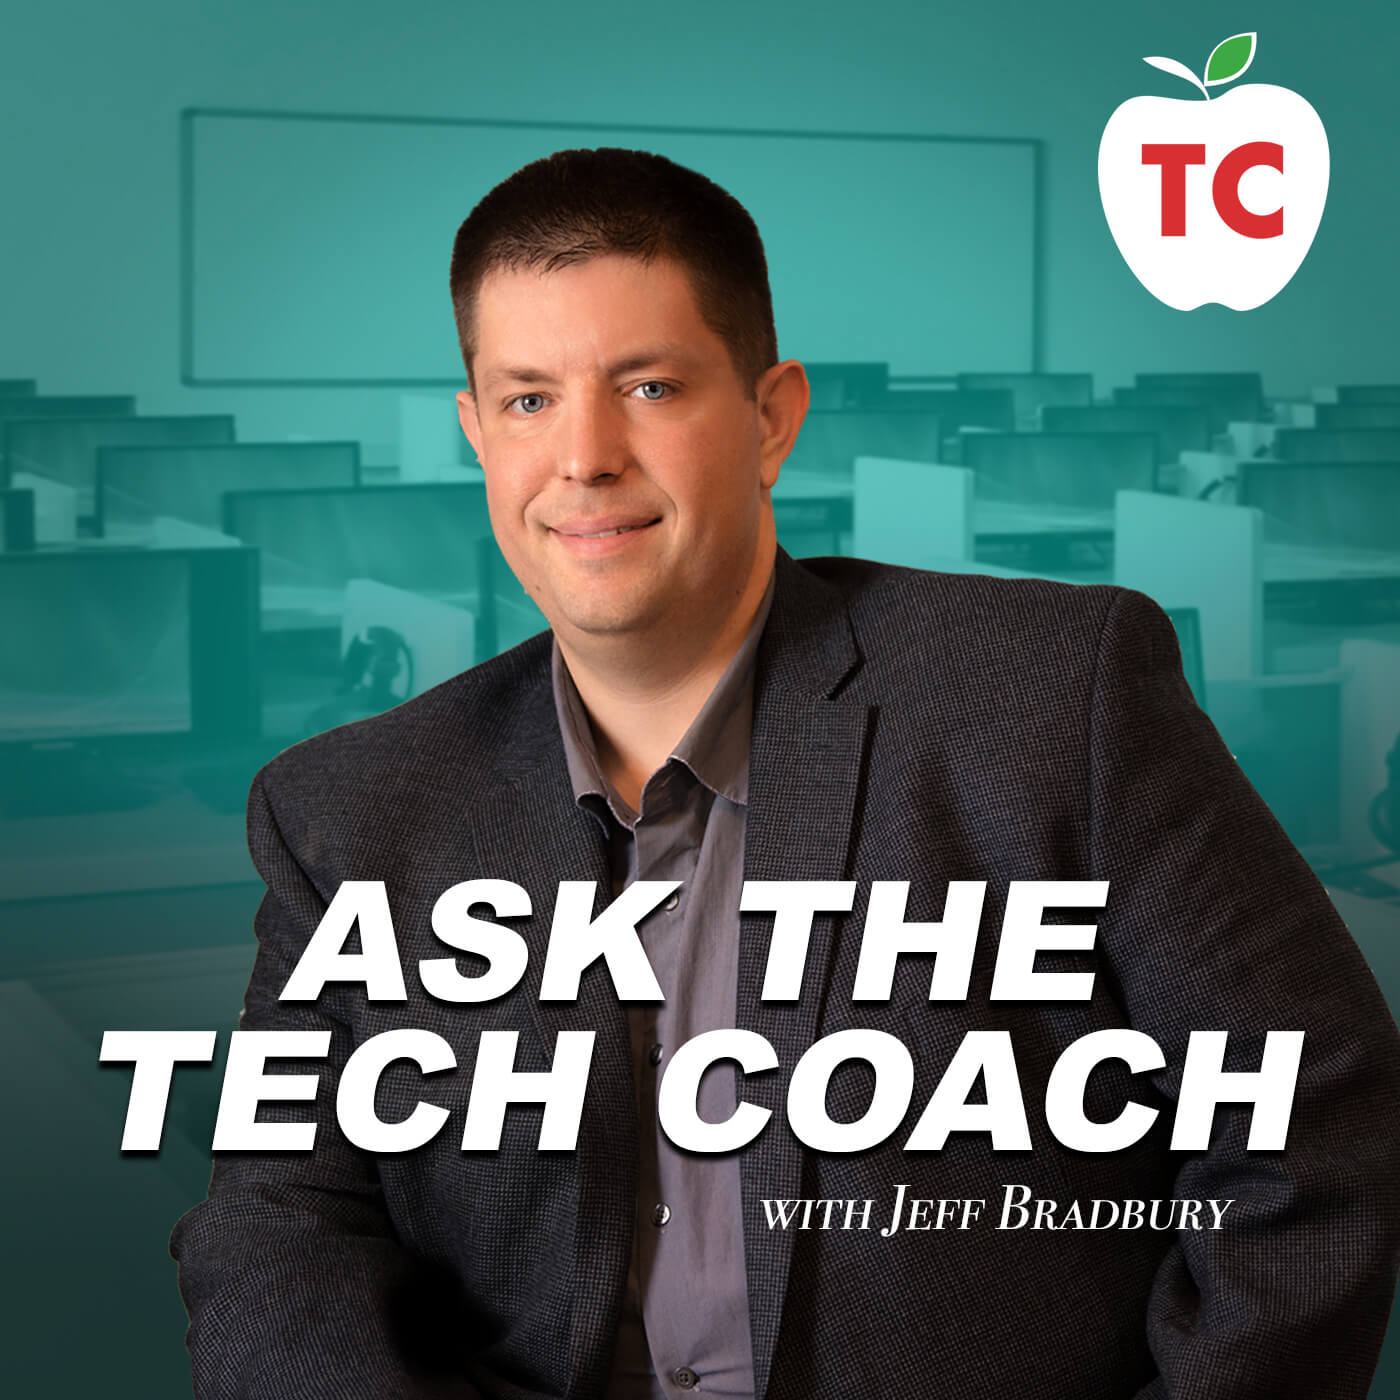 Jeff Bradberry, Ask the tech coach